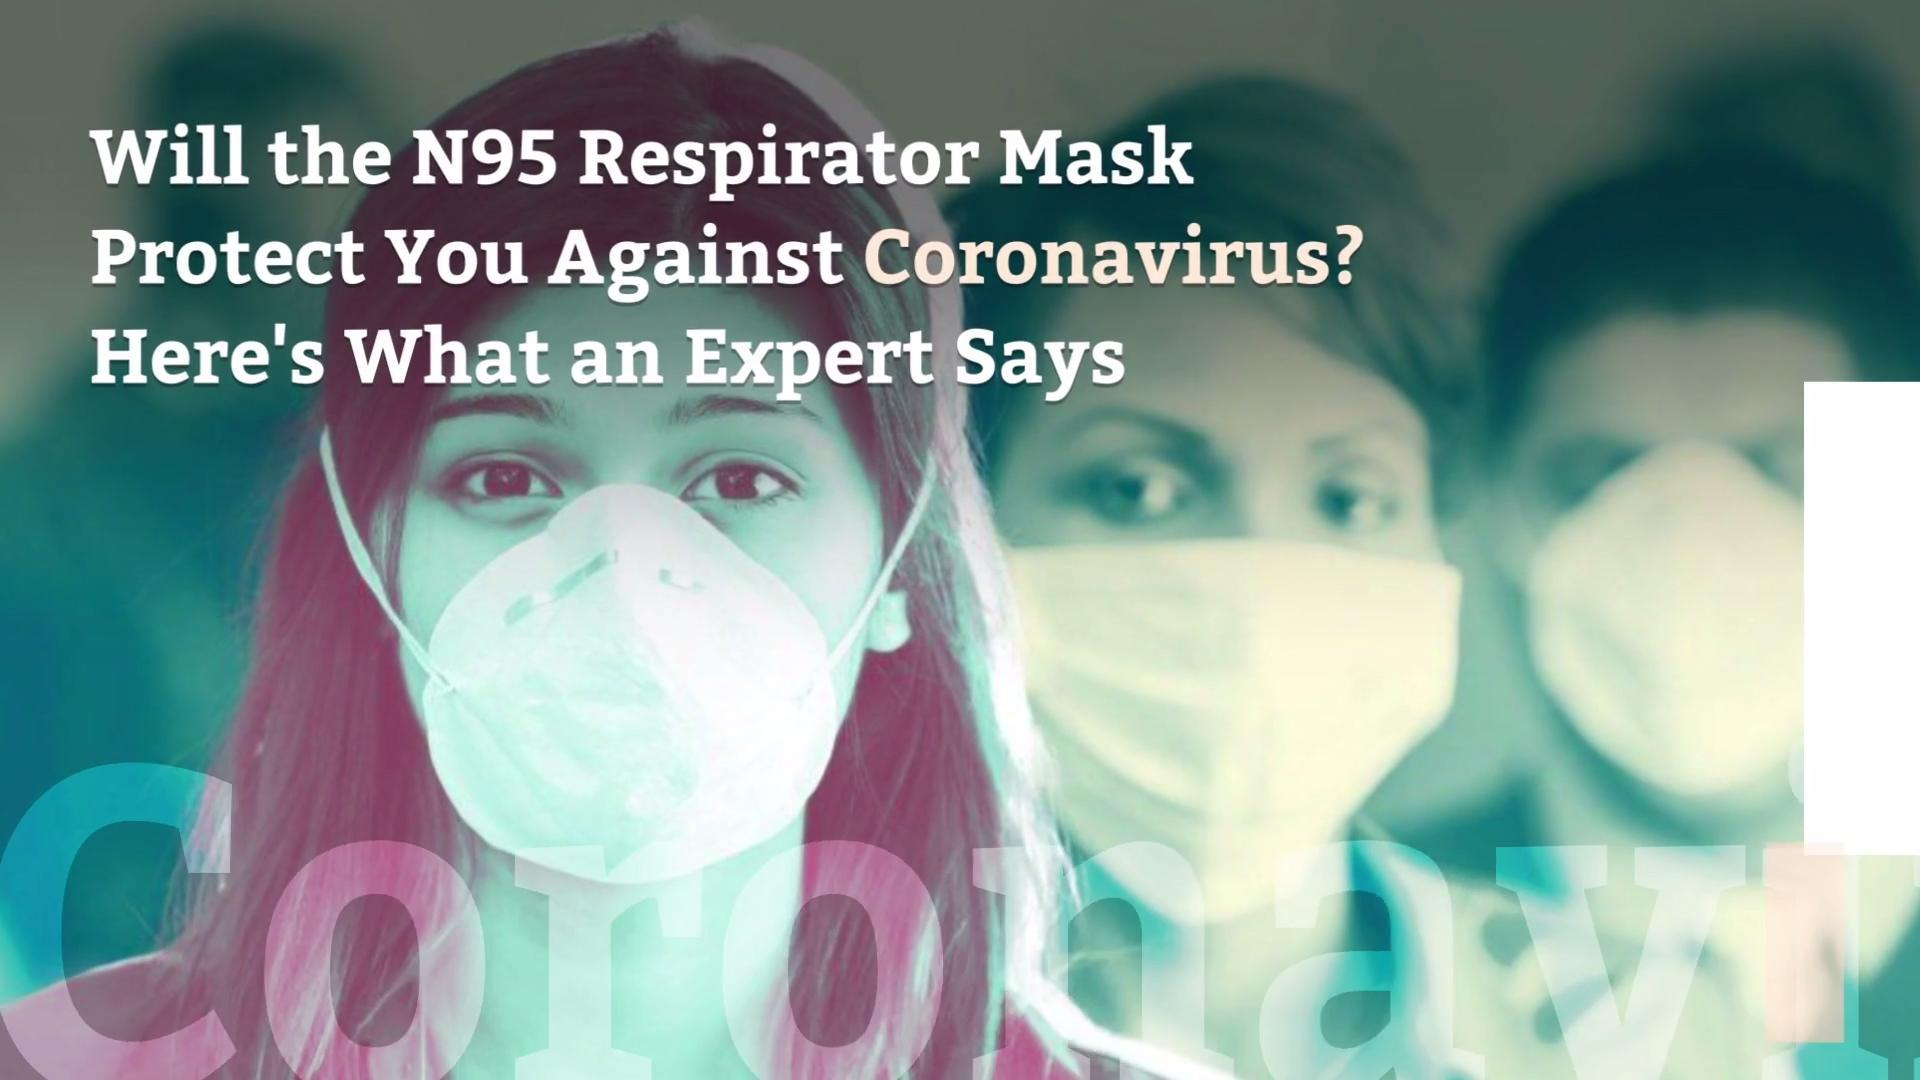 Will The N95 Respirator Mask Protect You Against Coronavirus